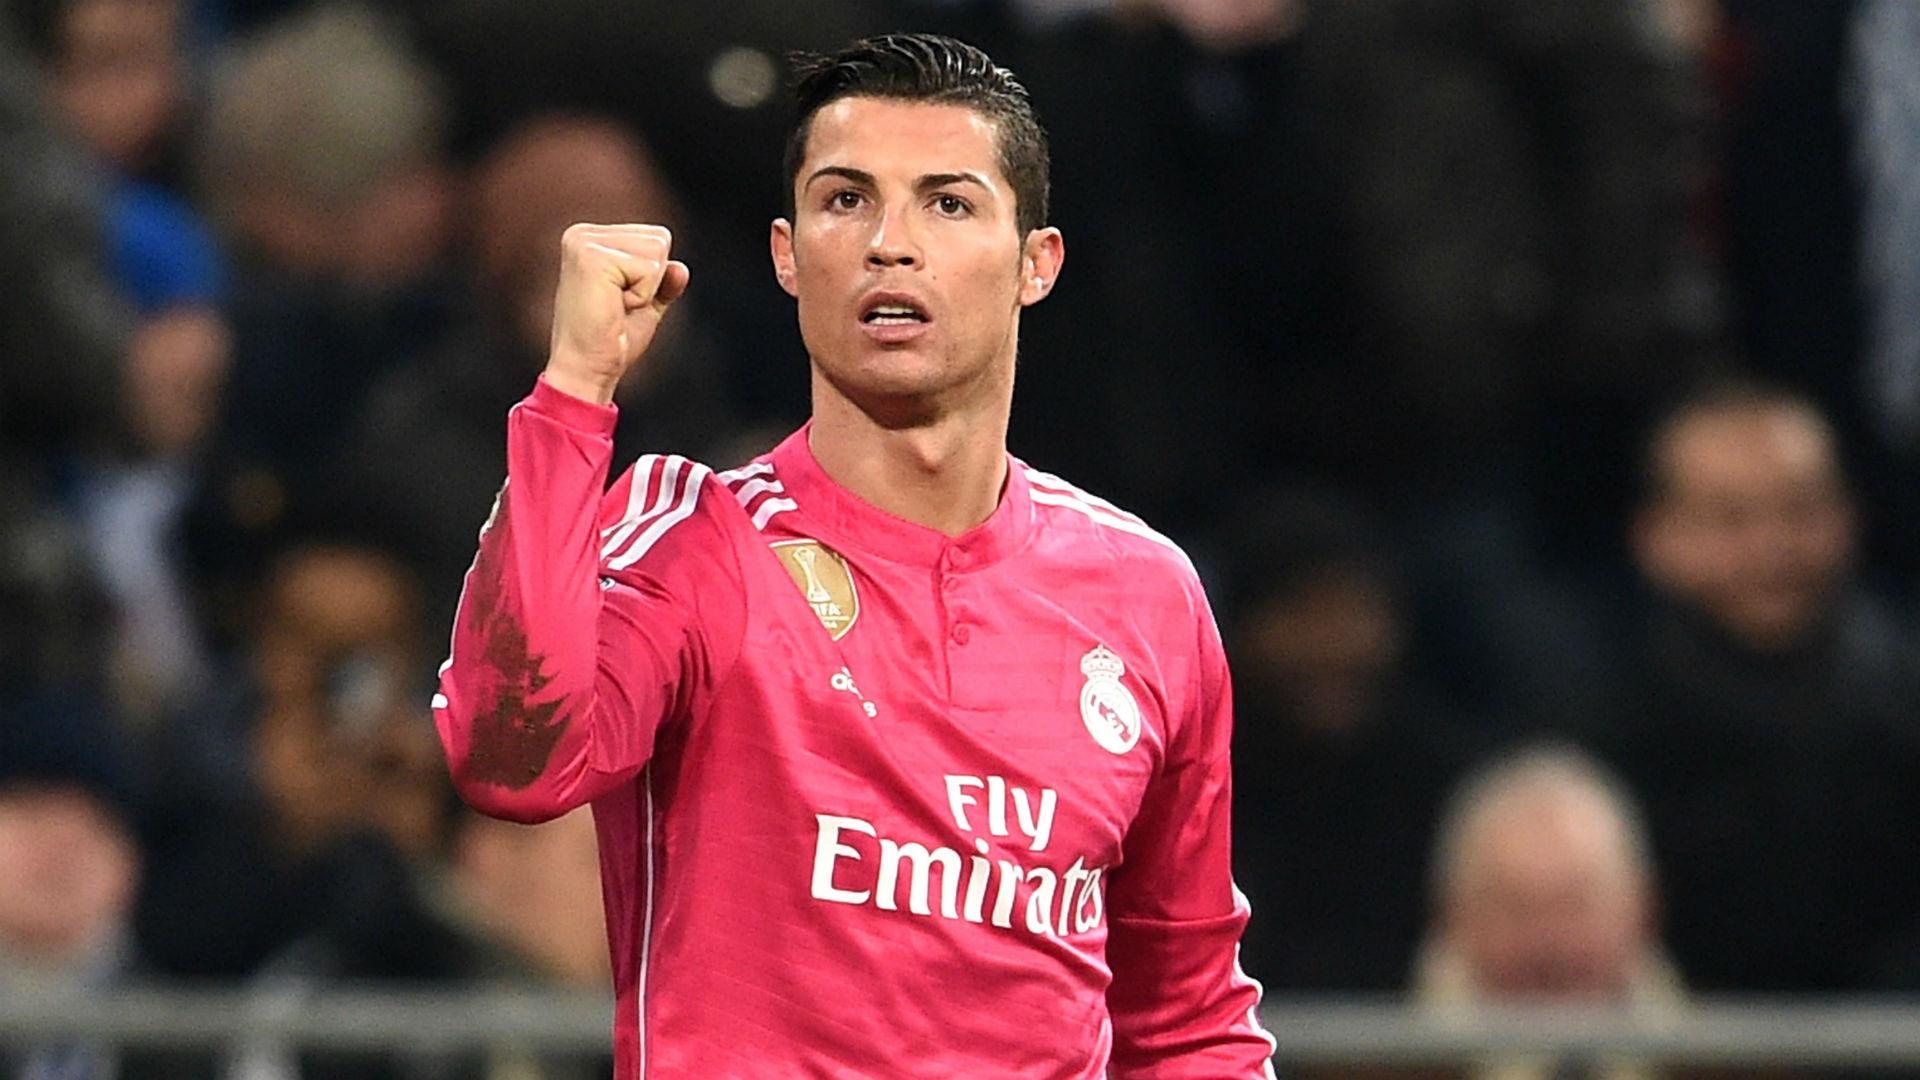 Cristiano-Ronaldo-021915-Getty-FTR.jpg